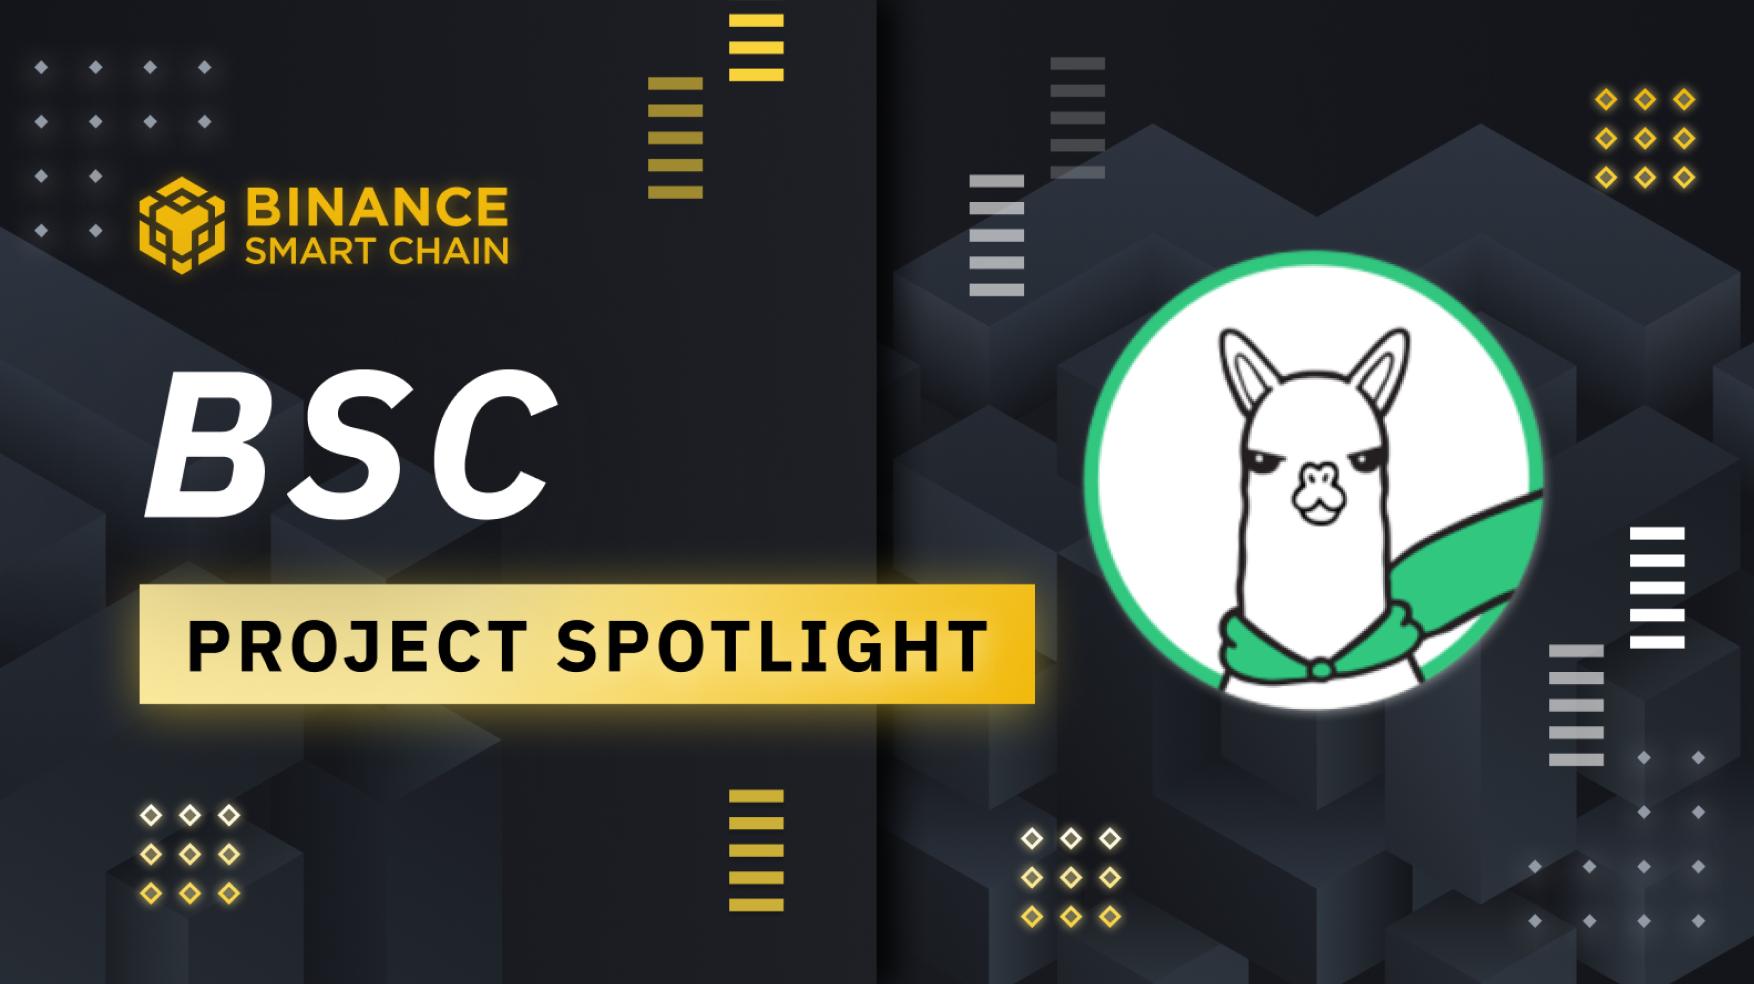 BSC Project Spotlight: Alpaca Finance